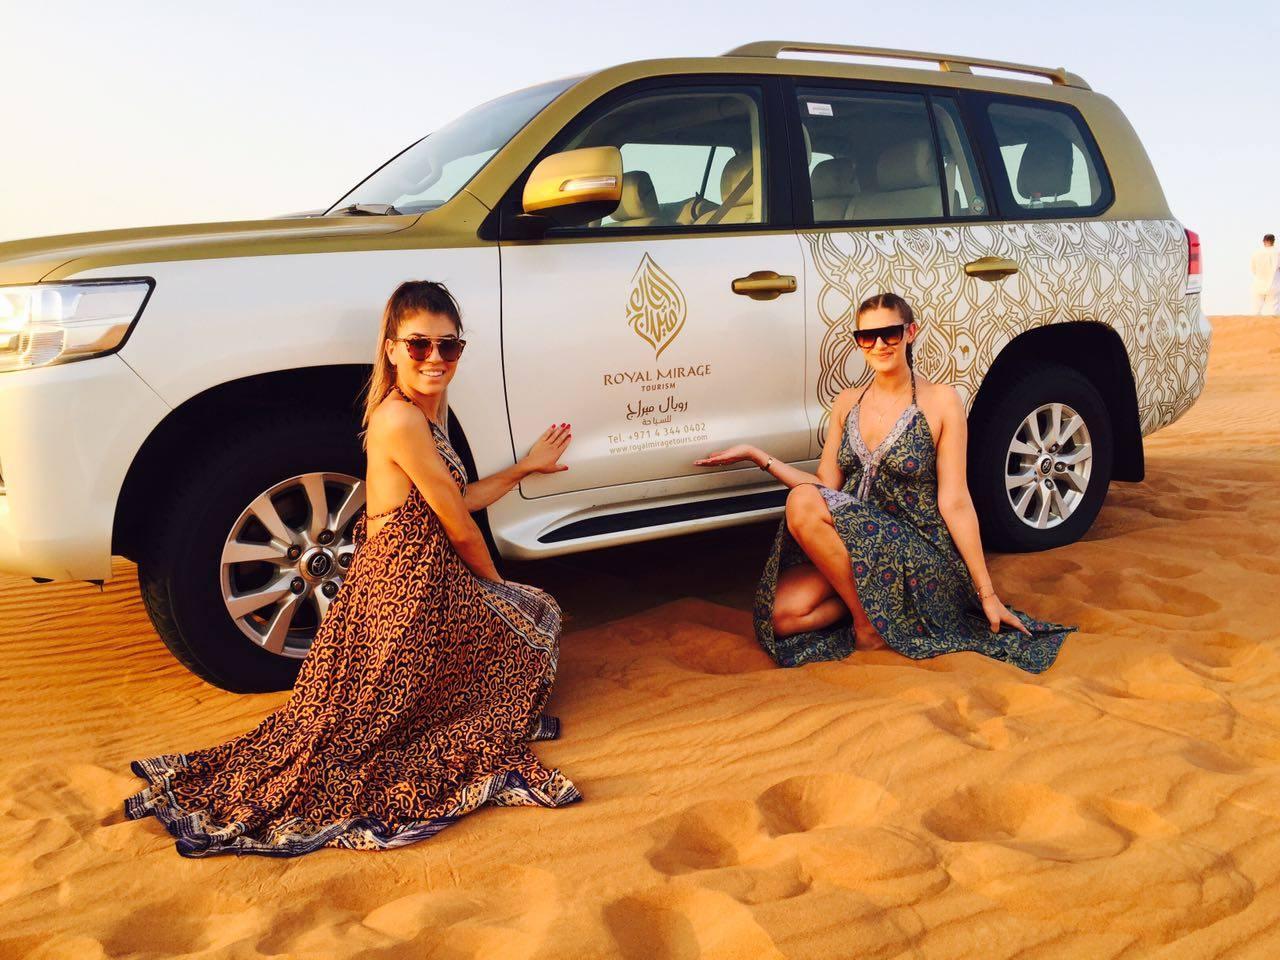 A List of Reliable Tour Operators in Dubai